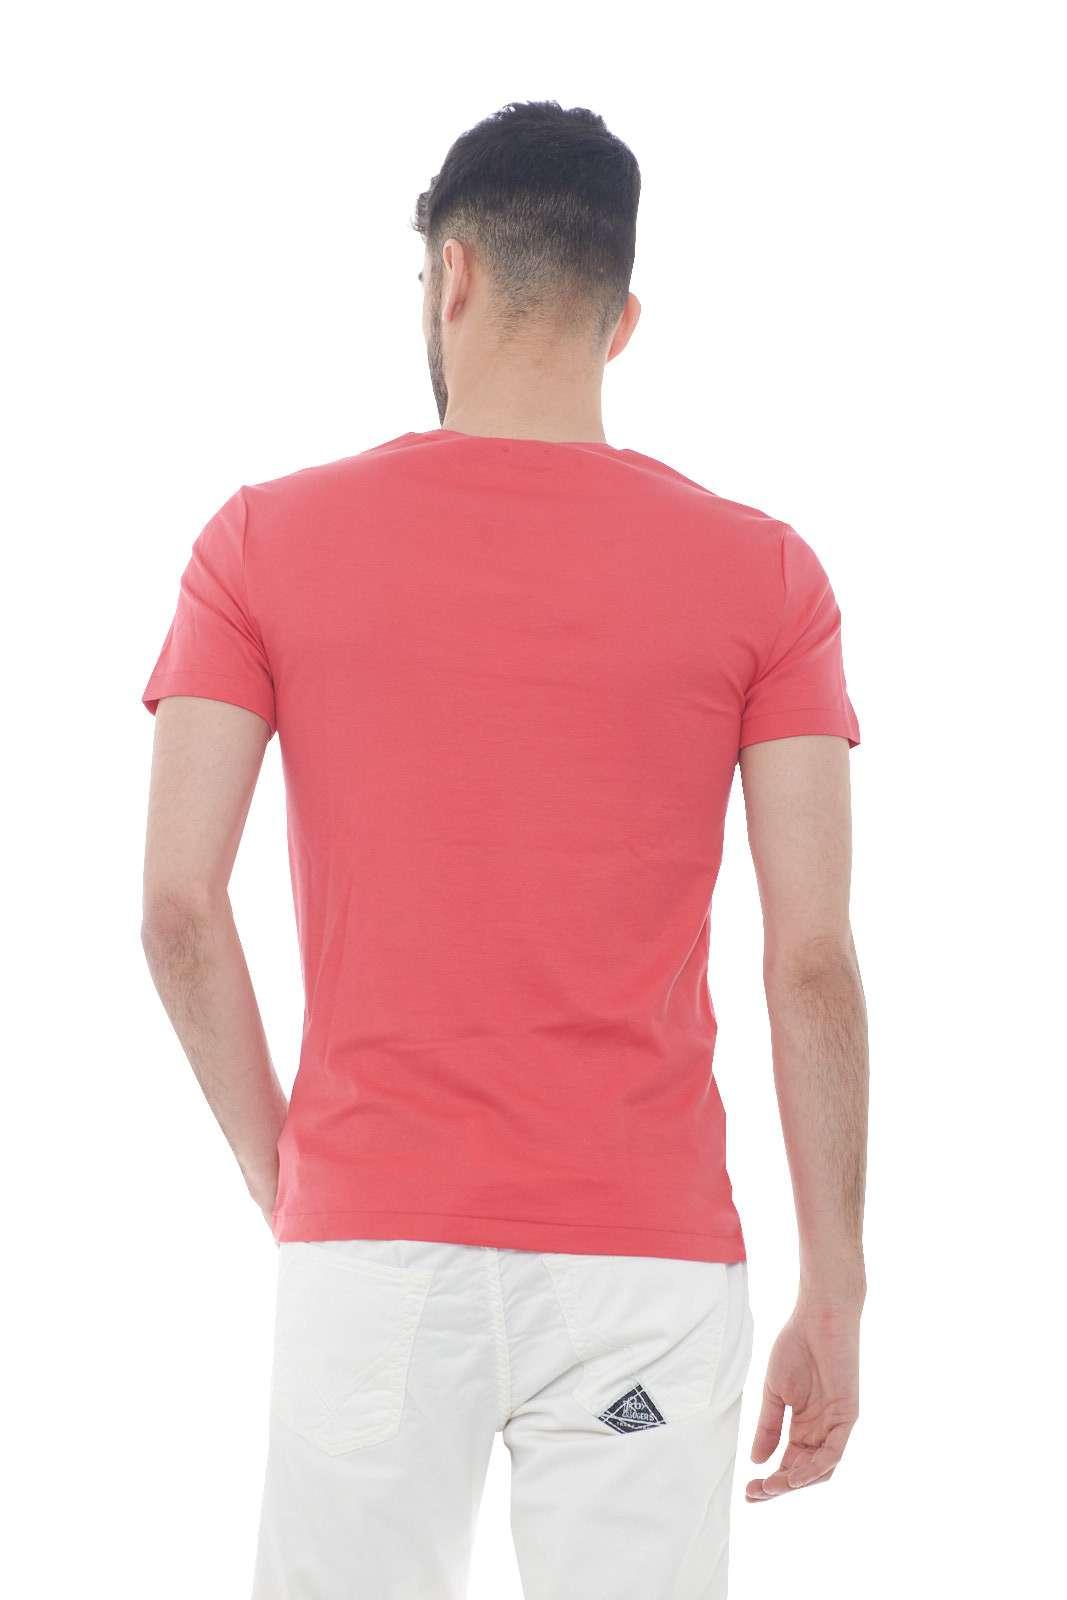 https://www.parmax.com/media/catalog/product/a/i/PE-outlet_parmax-t-shirt-uomo-Ralph-Lauren-710740727-C.jpg